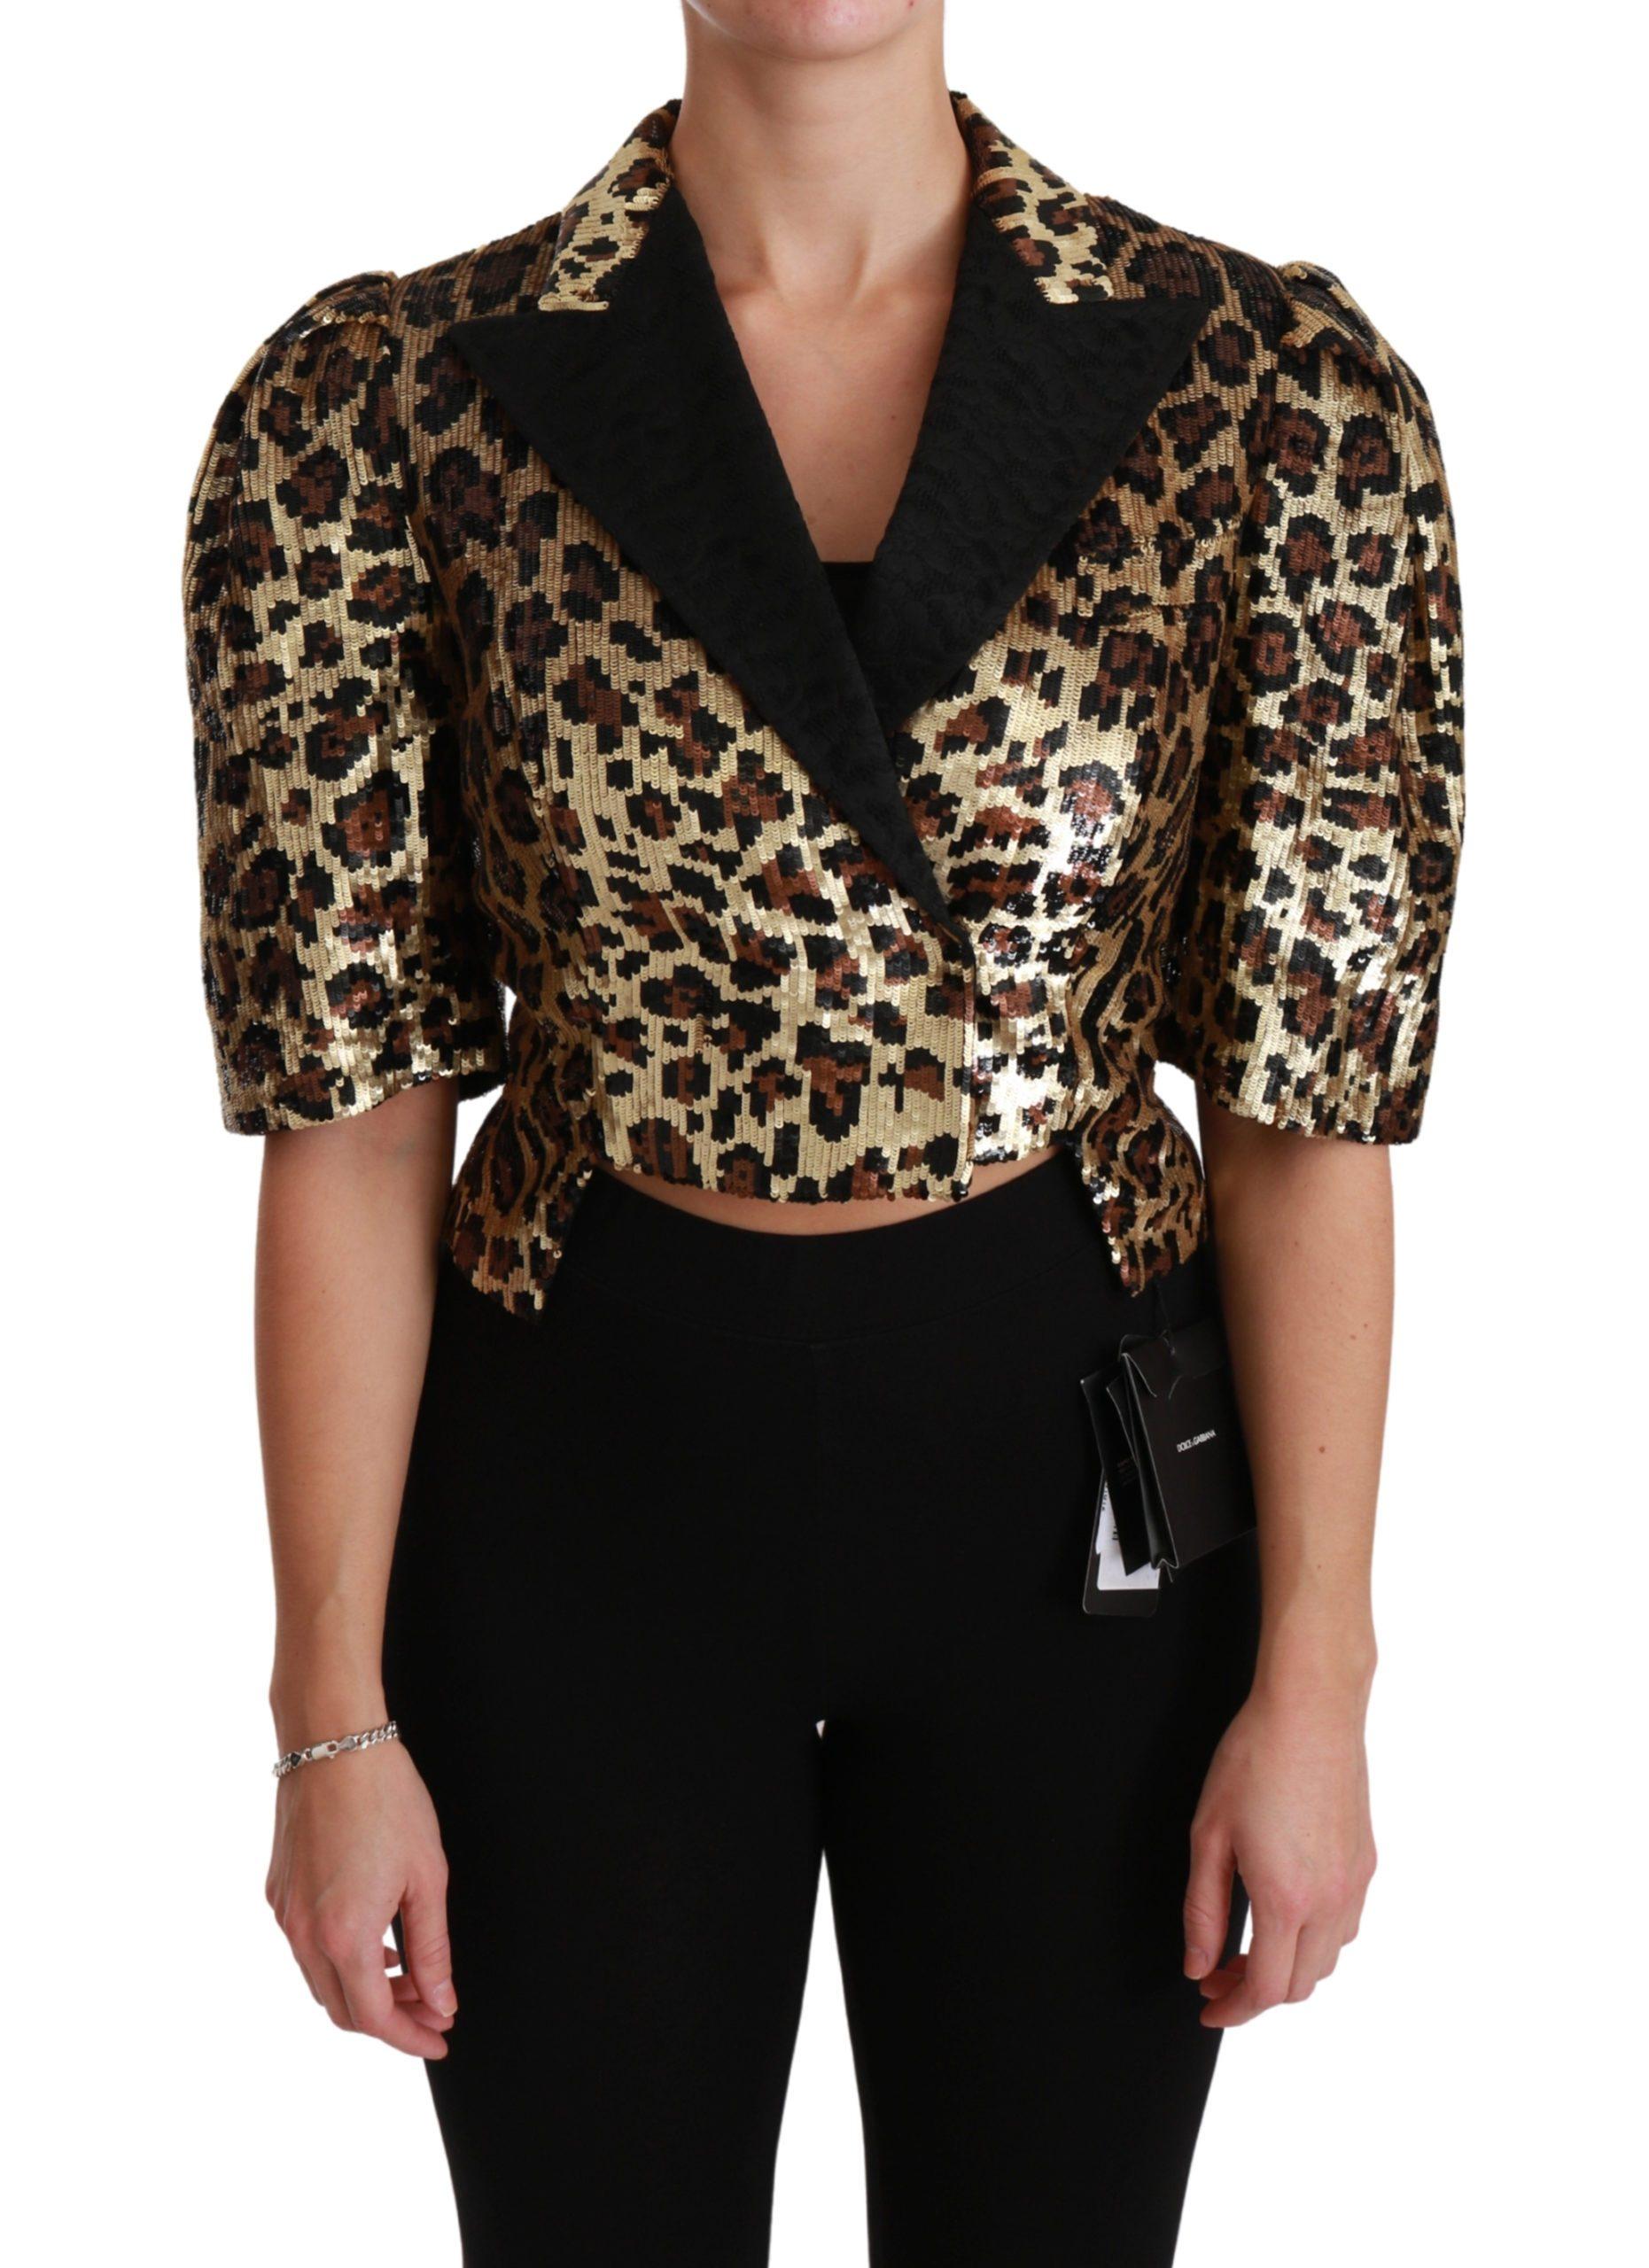 Dolce & Gabbana Women's Leopard Sequined Jacket Yellow JKT2564 - IT36 | XS